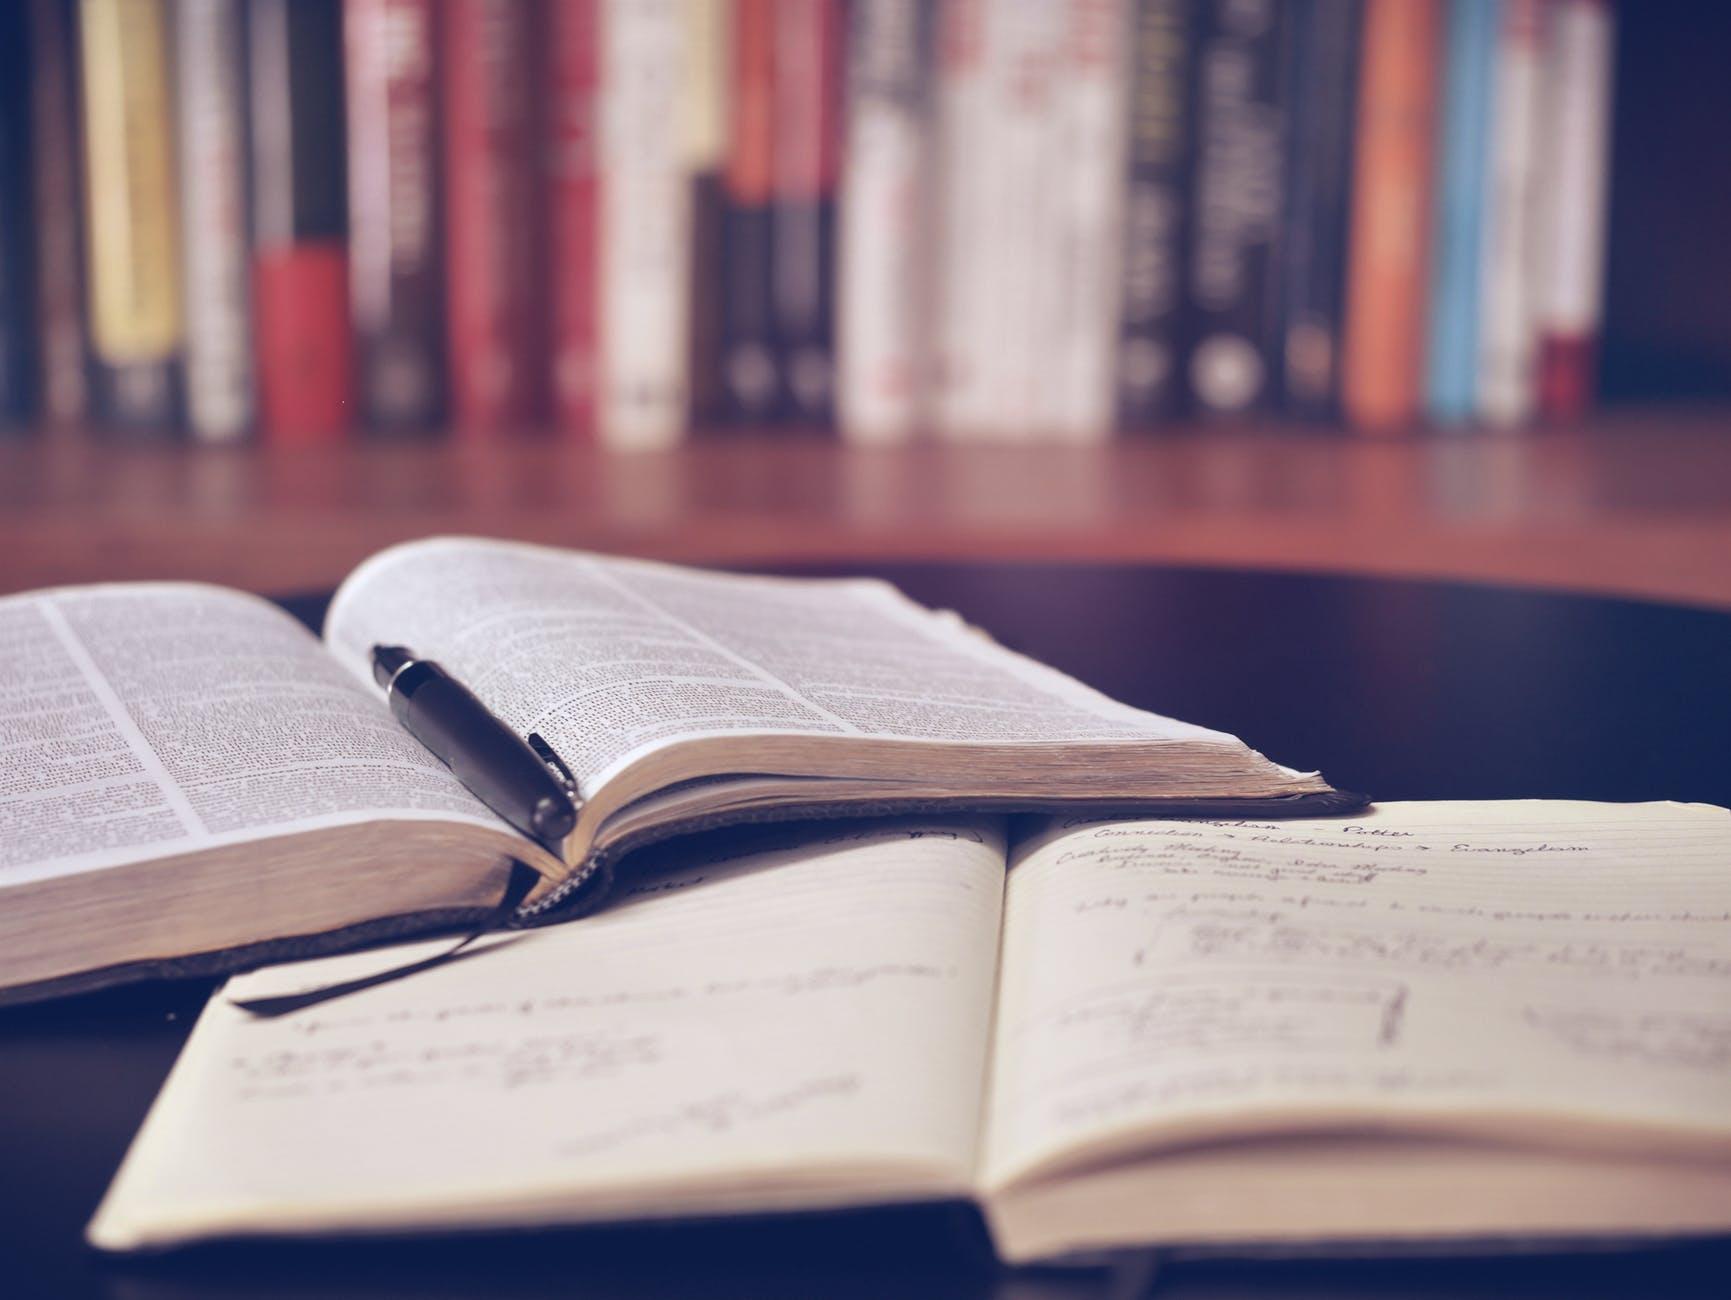 Kitap - Kunduz